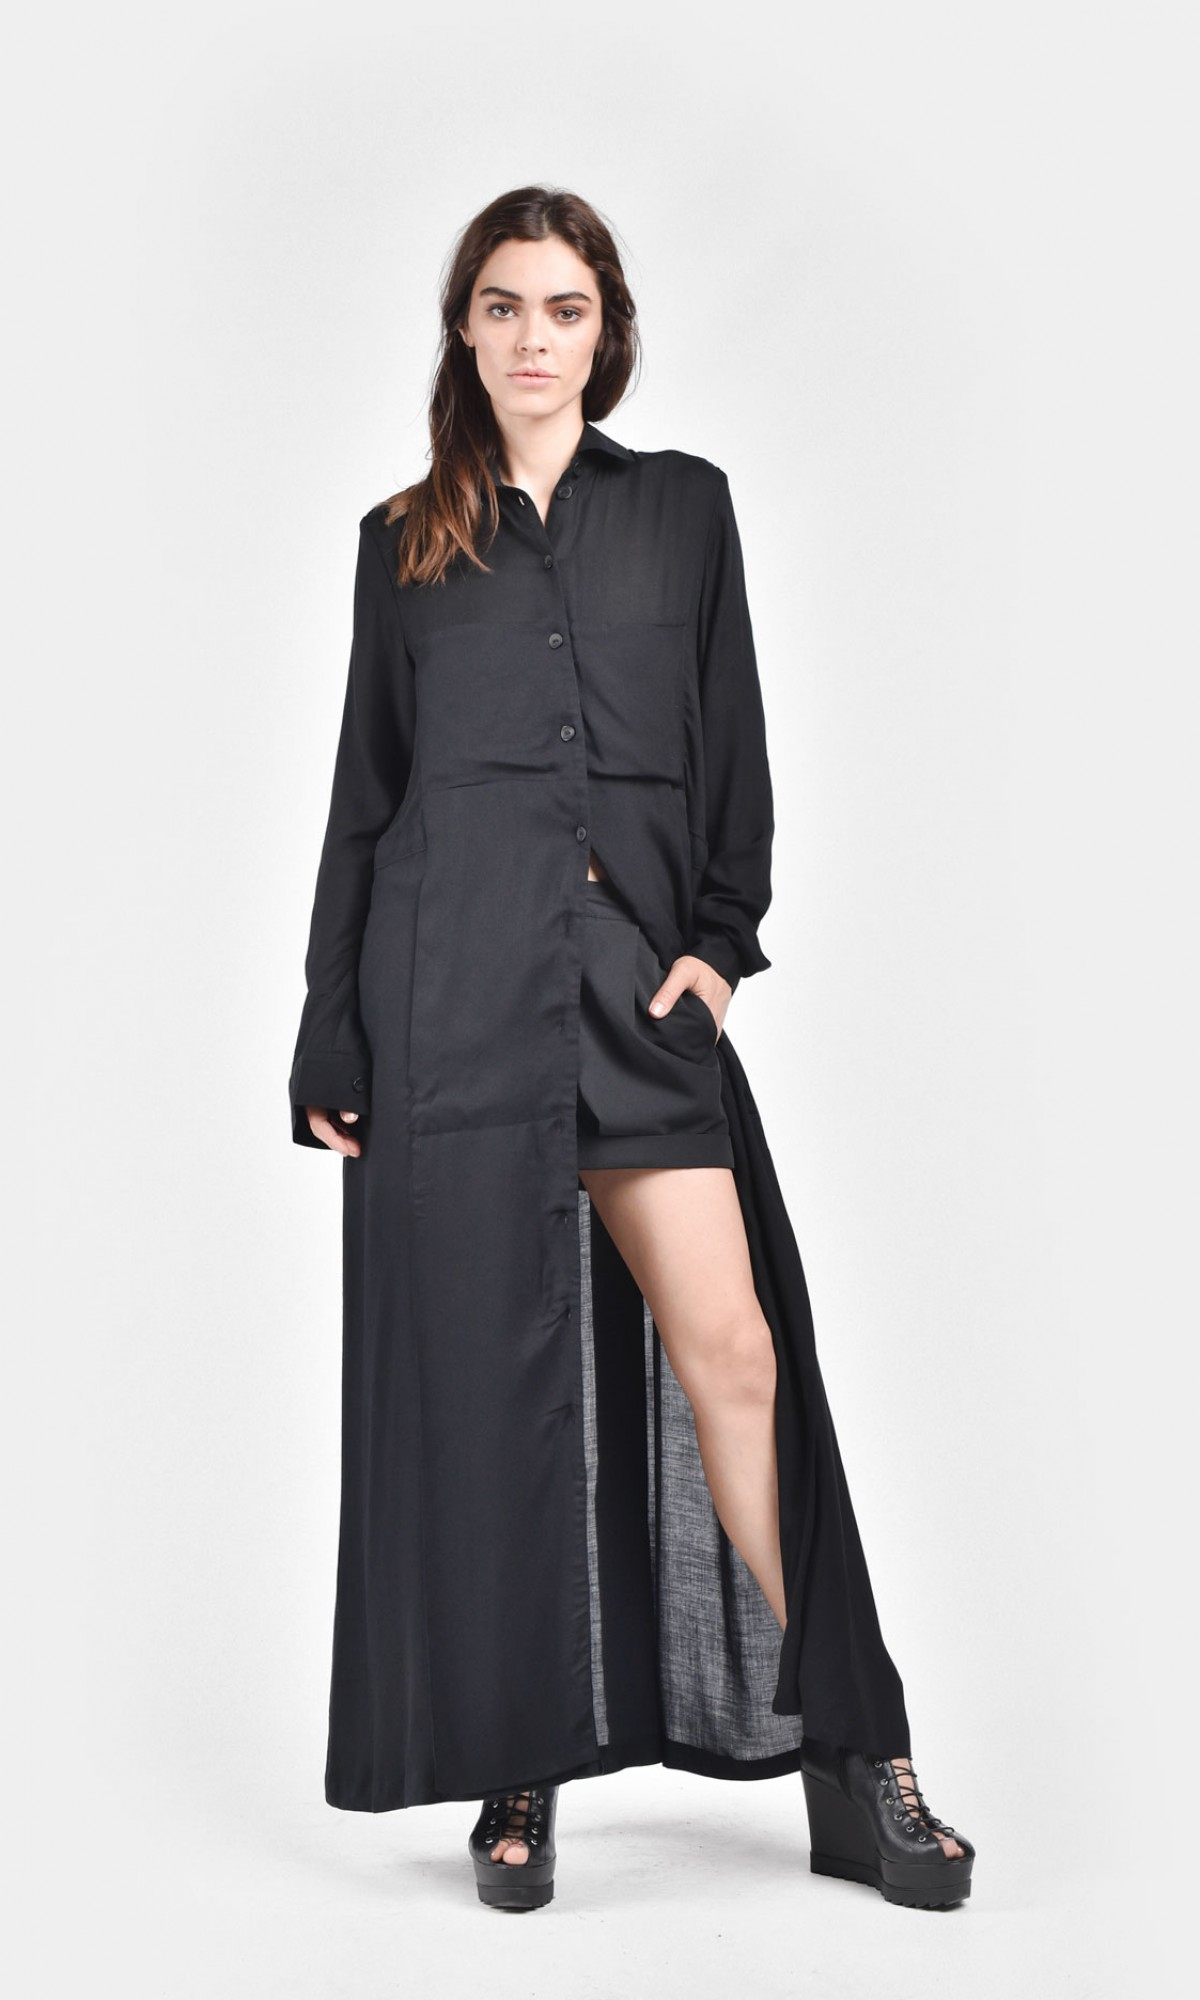 Black Maxi Dress with Side Pockets A03333